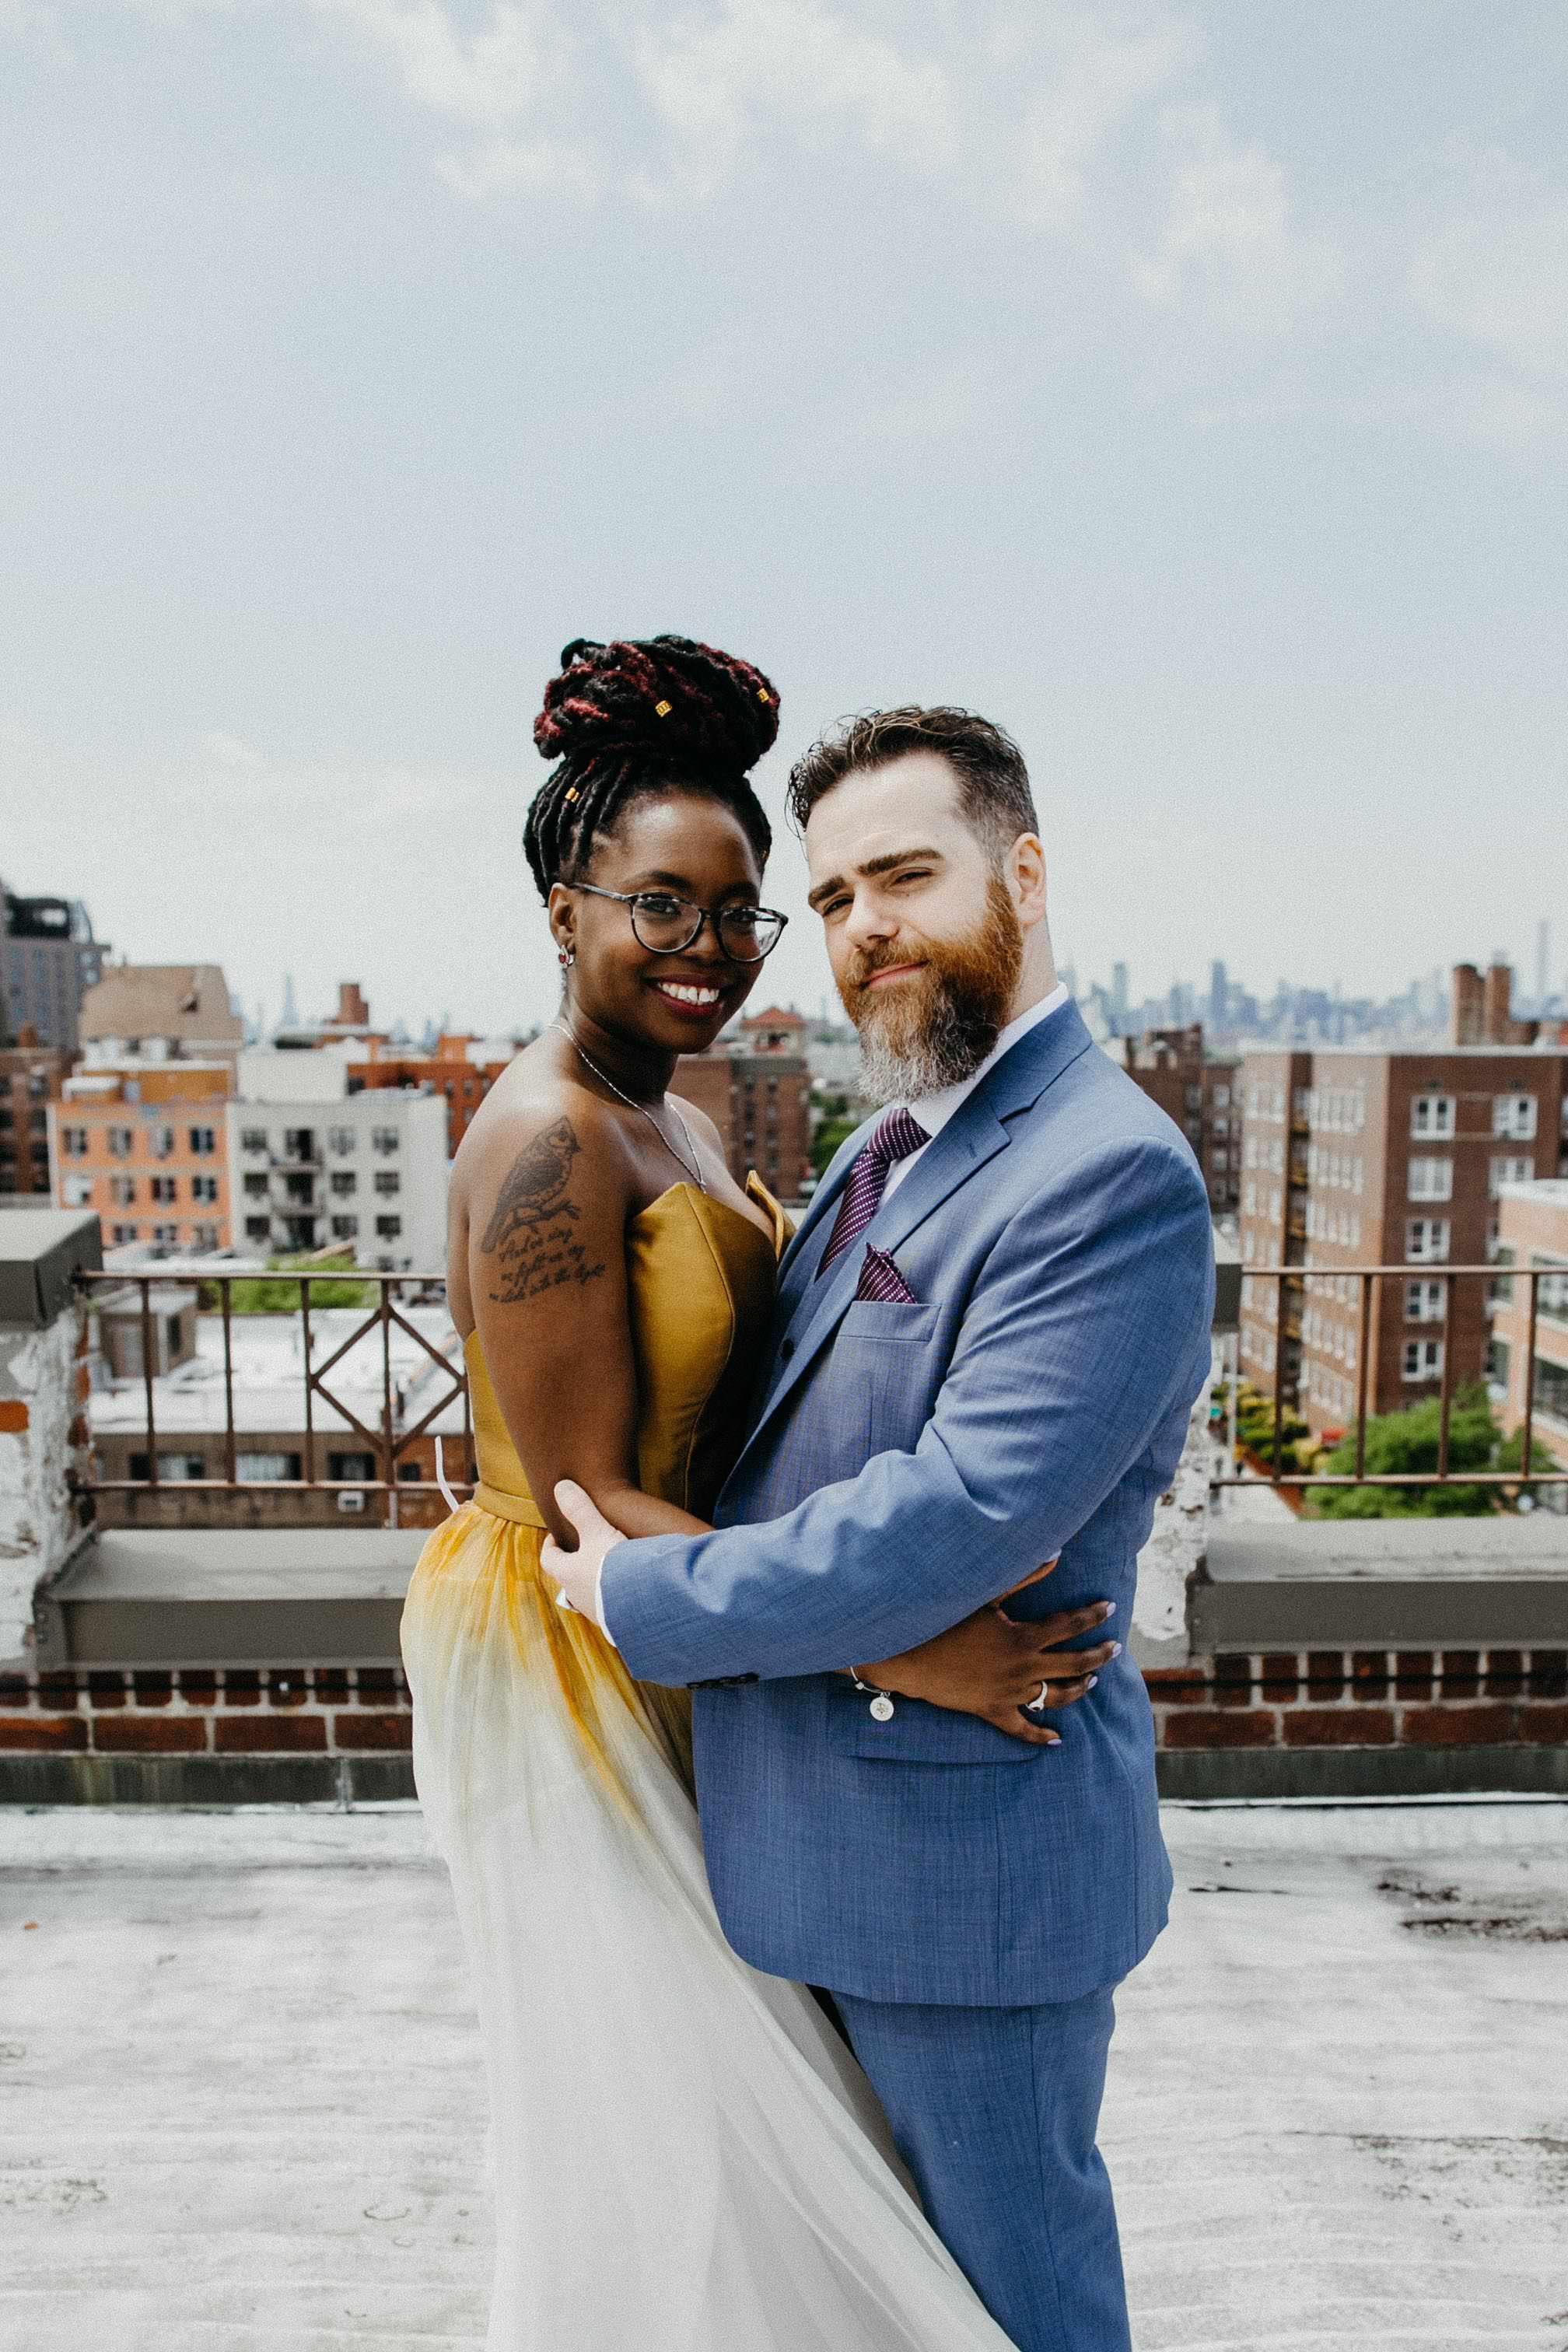 Sevlynn-Photography-Wedding-LIC-Landing-Maiella-NYC-8.jpg